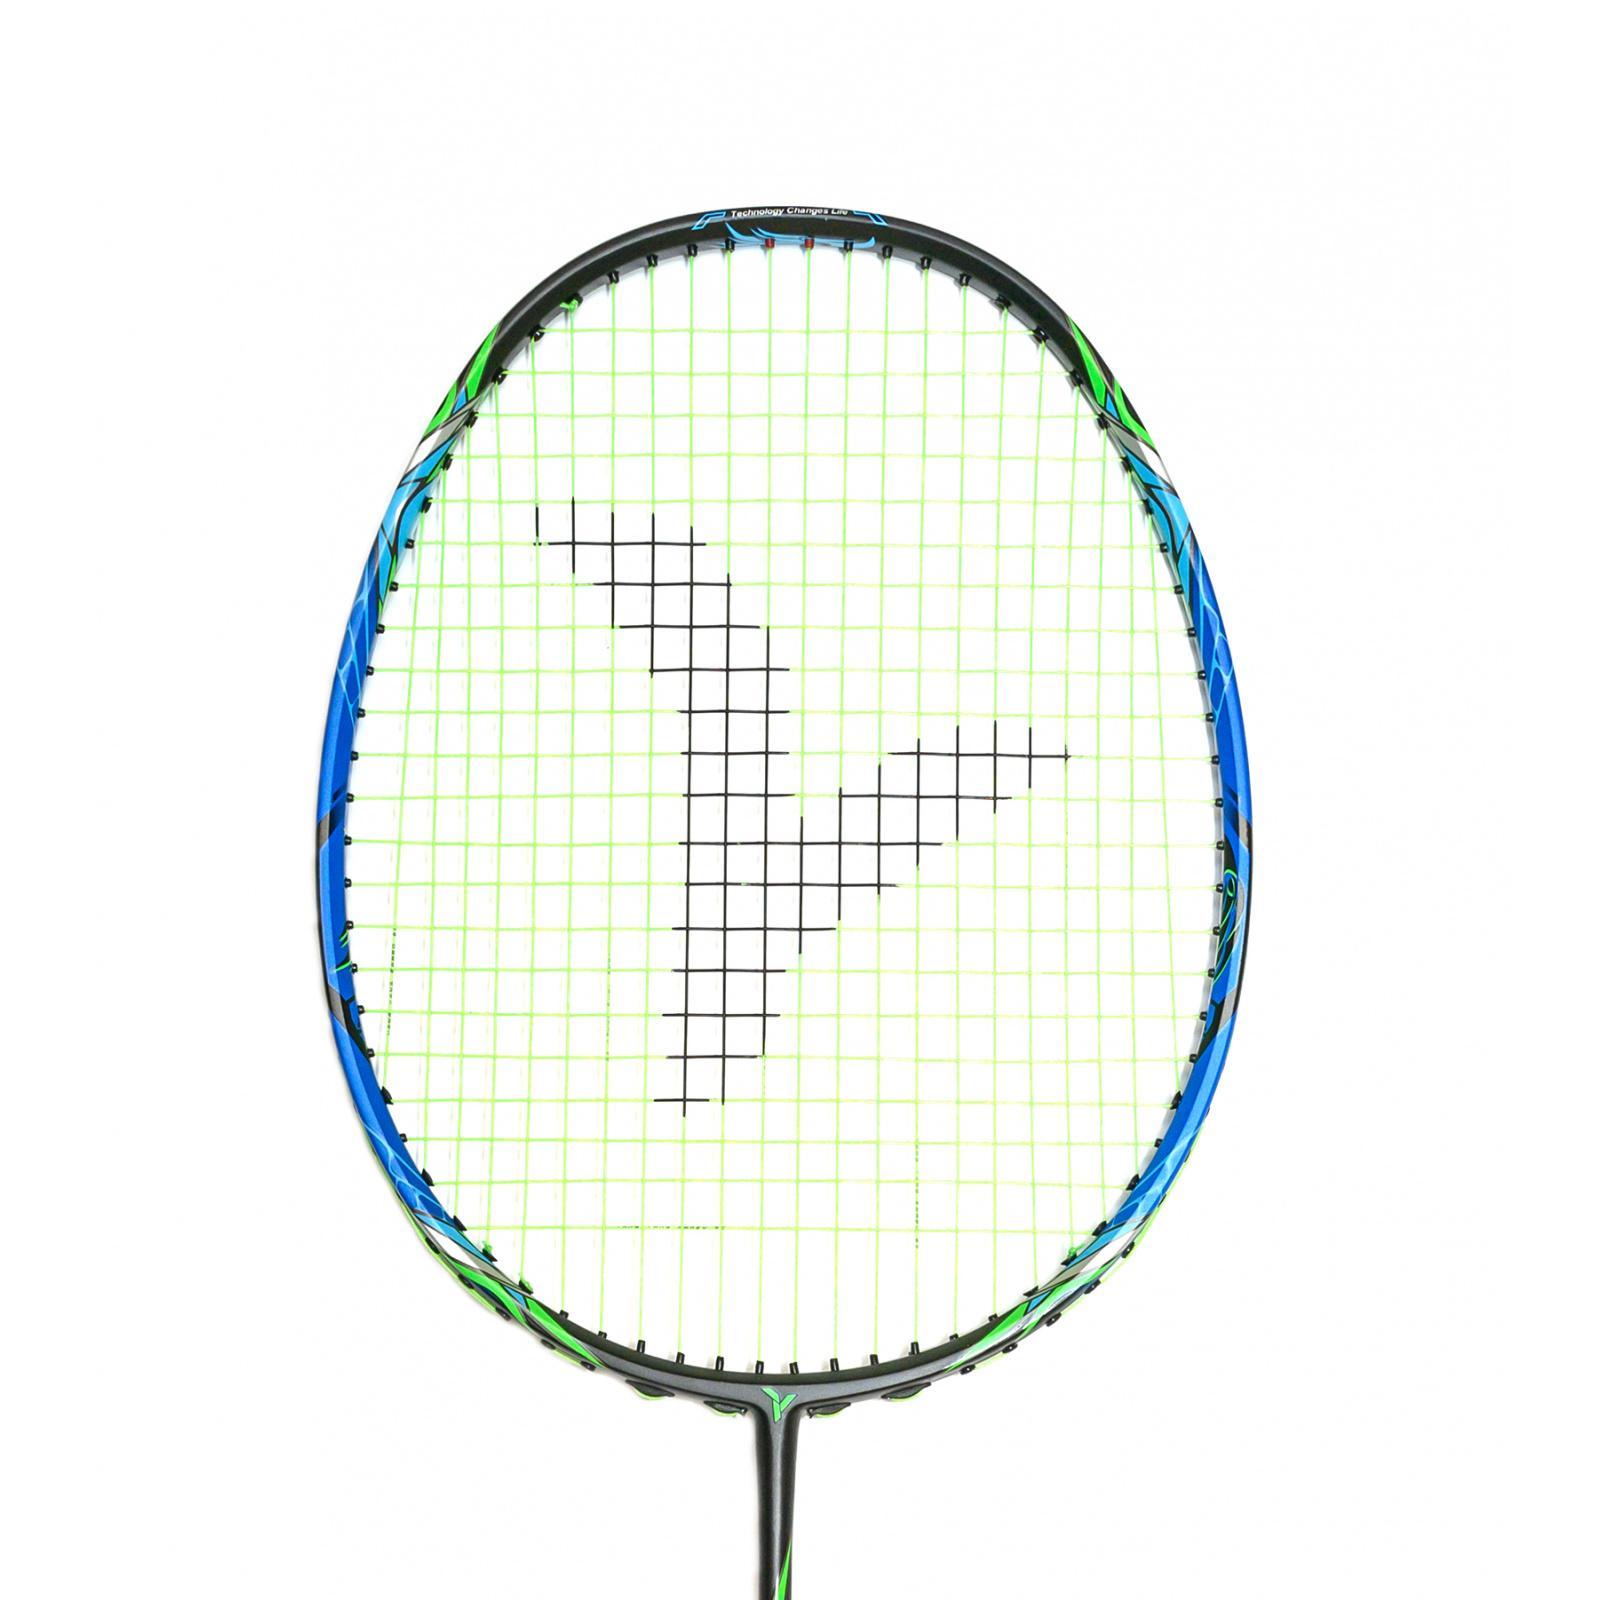 https://www.badec.store/produkty_img/badmintonova-raketa1570722069L.jpg